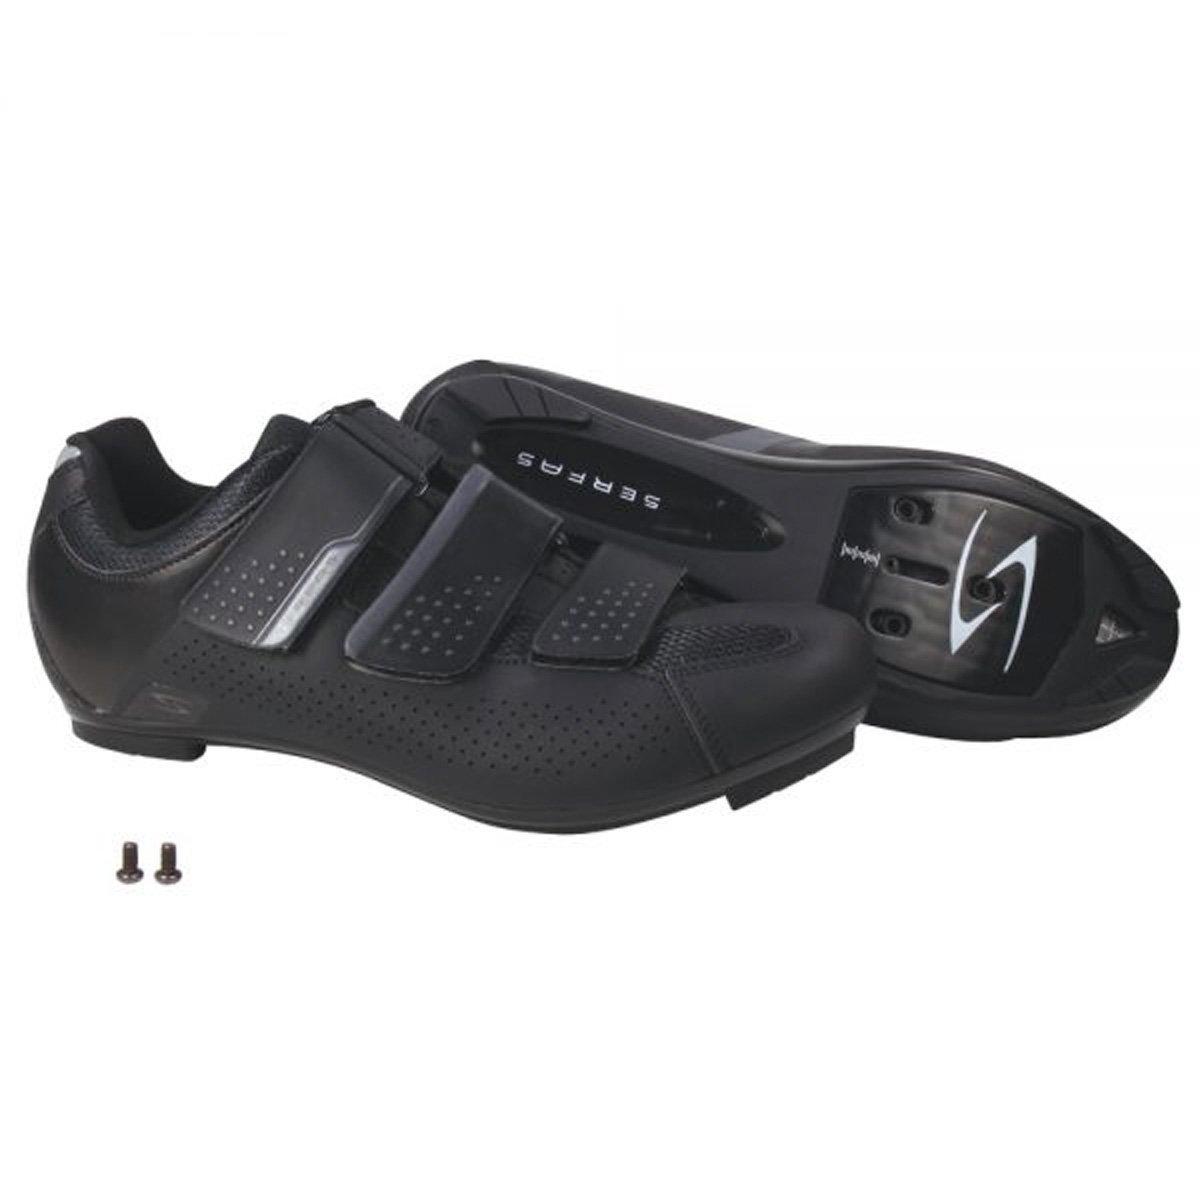 SerfasレディースPaceline 3-strap Road Cycling Shoe – swr-401b 37 ブラック B077JQFH66